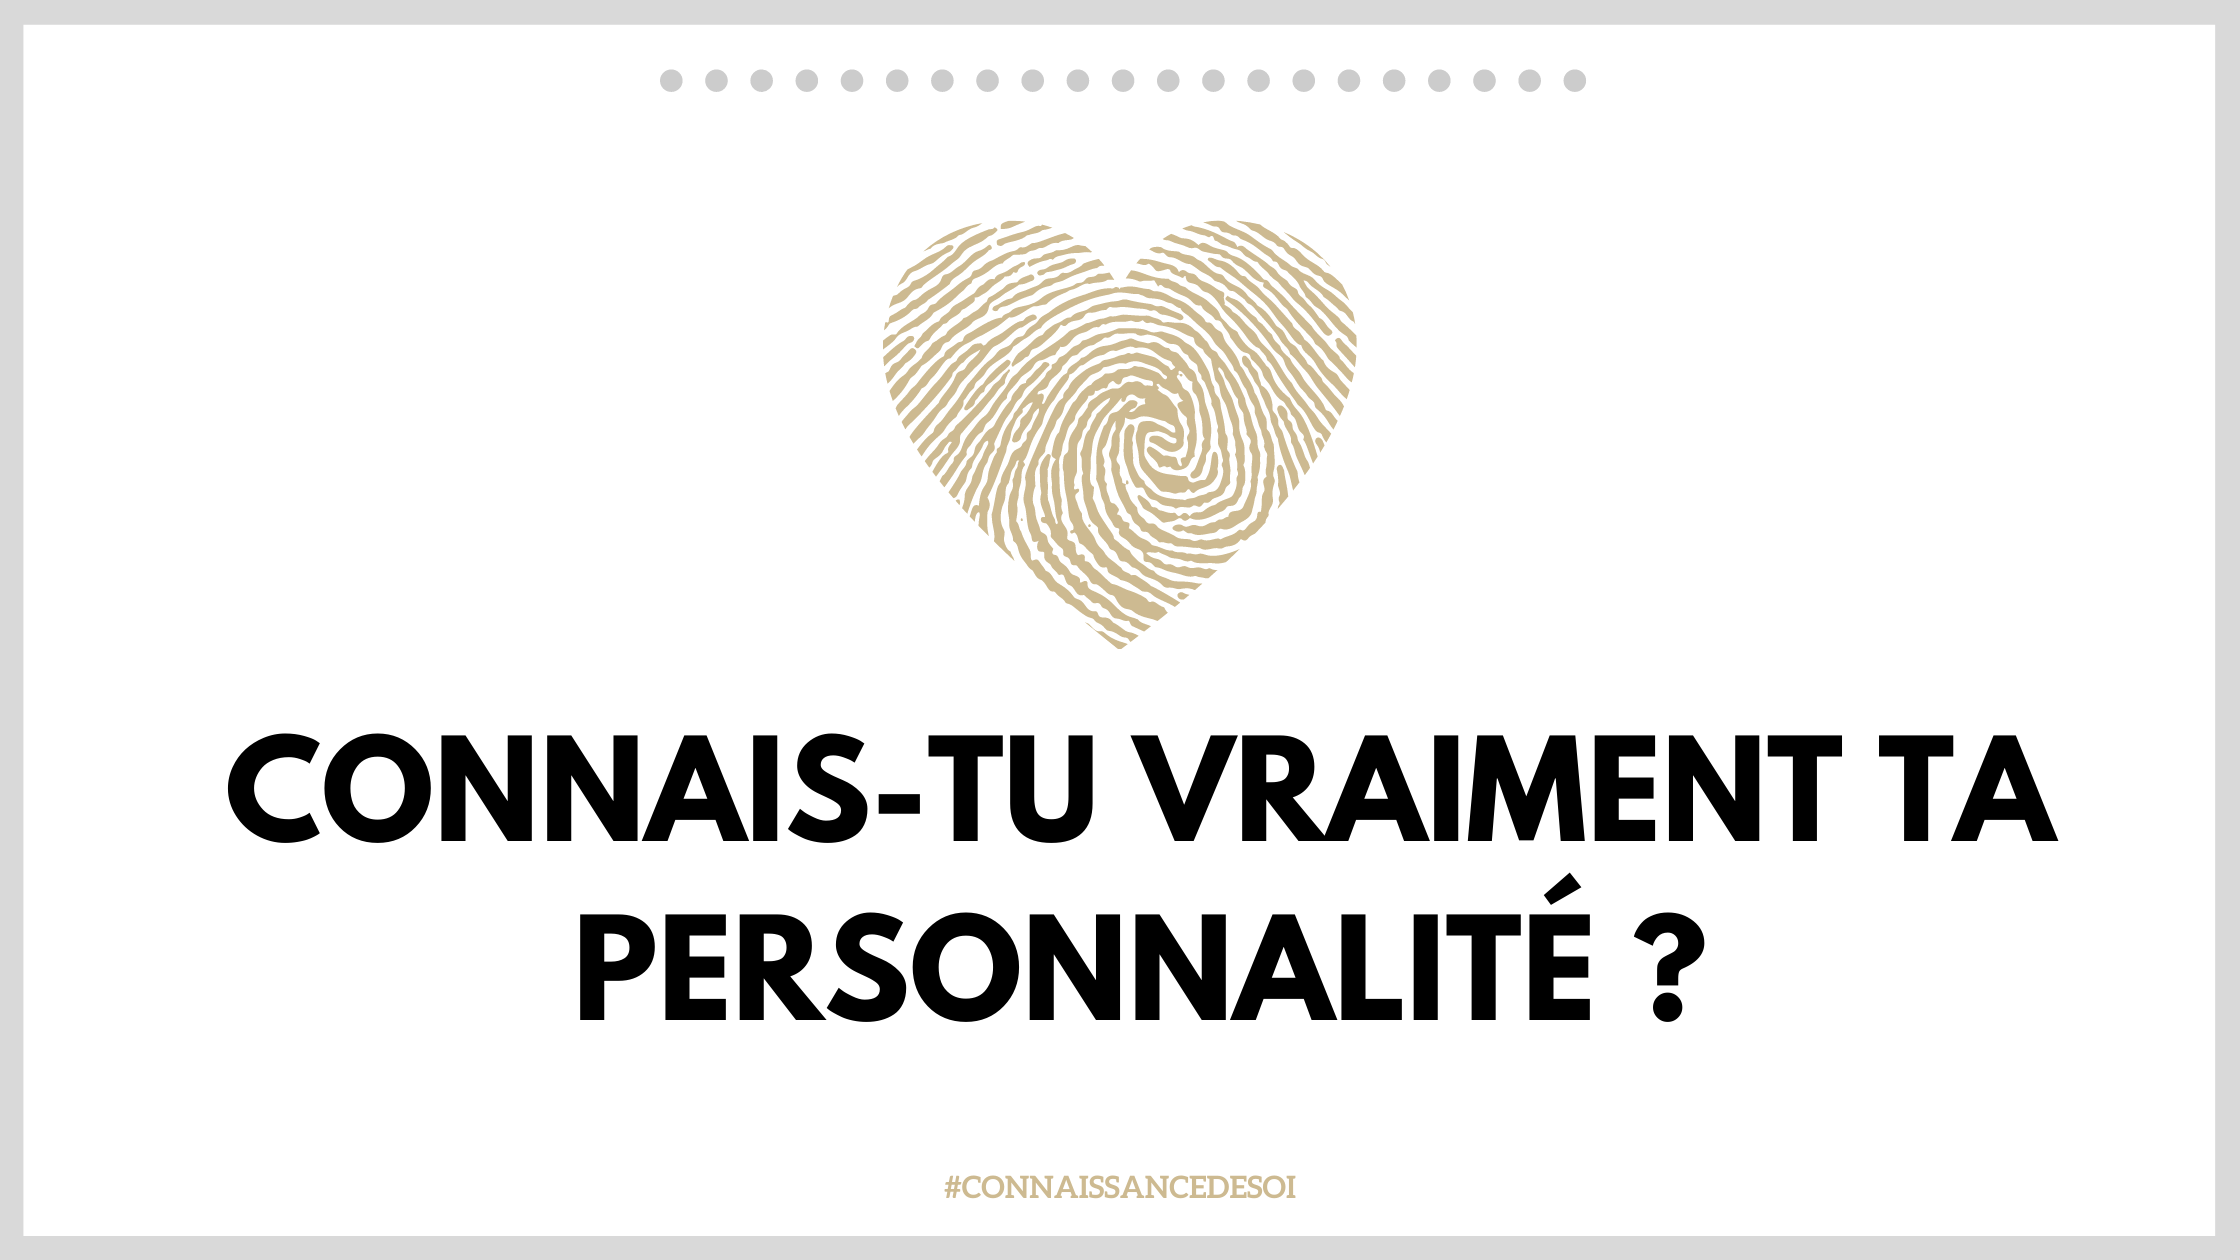 Connais-tu vraiment ta personnalité ?